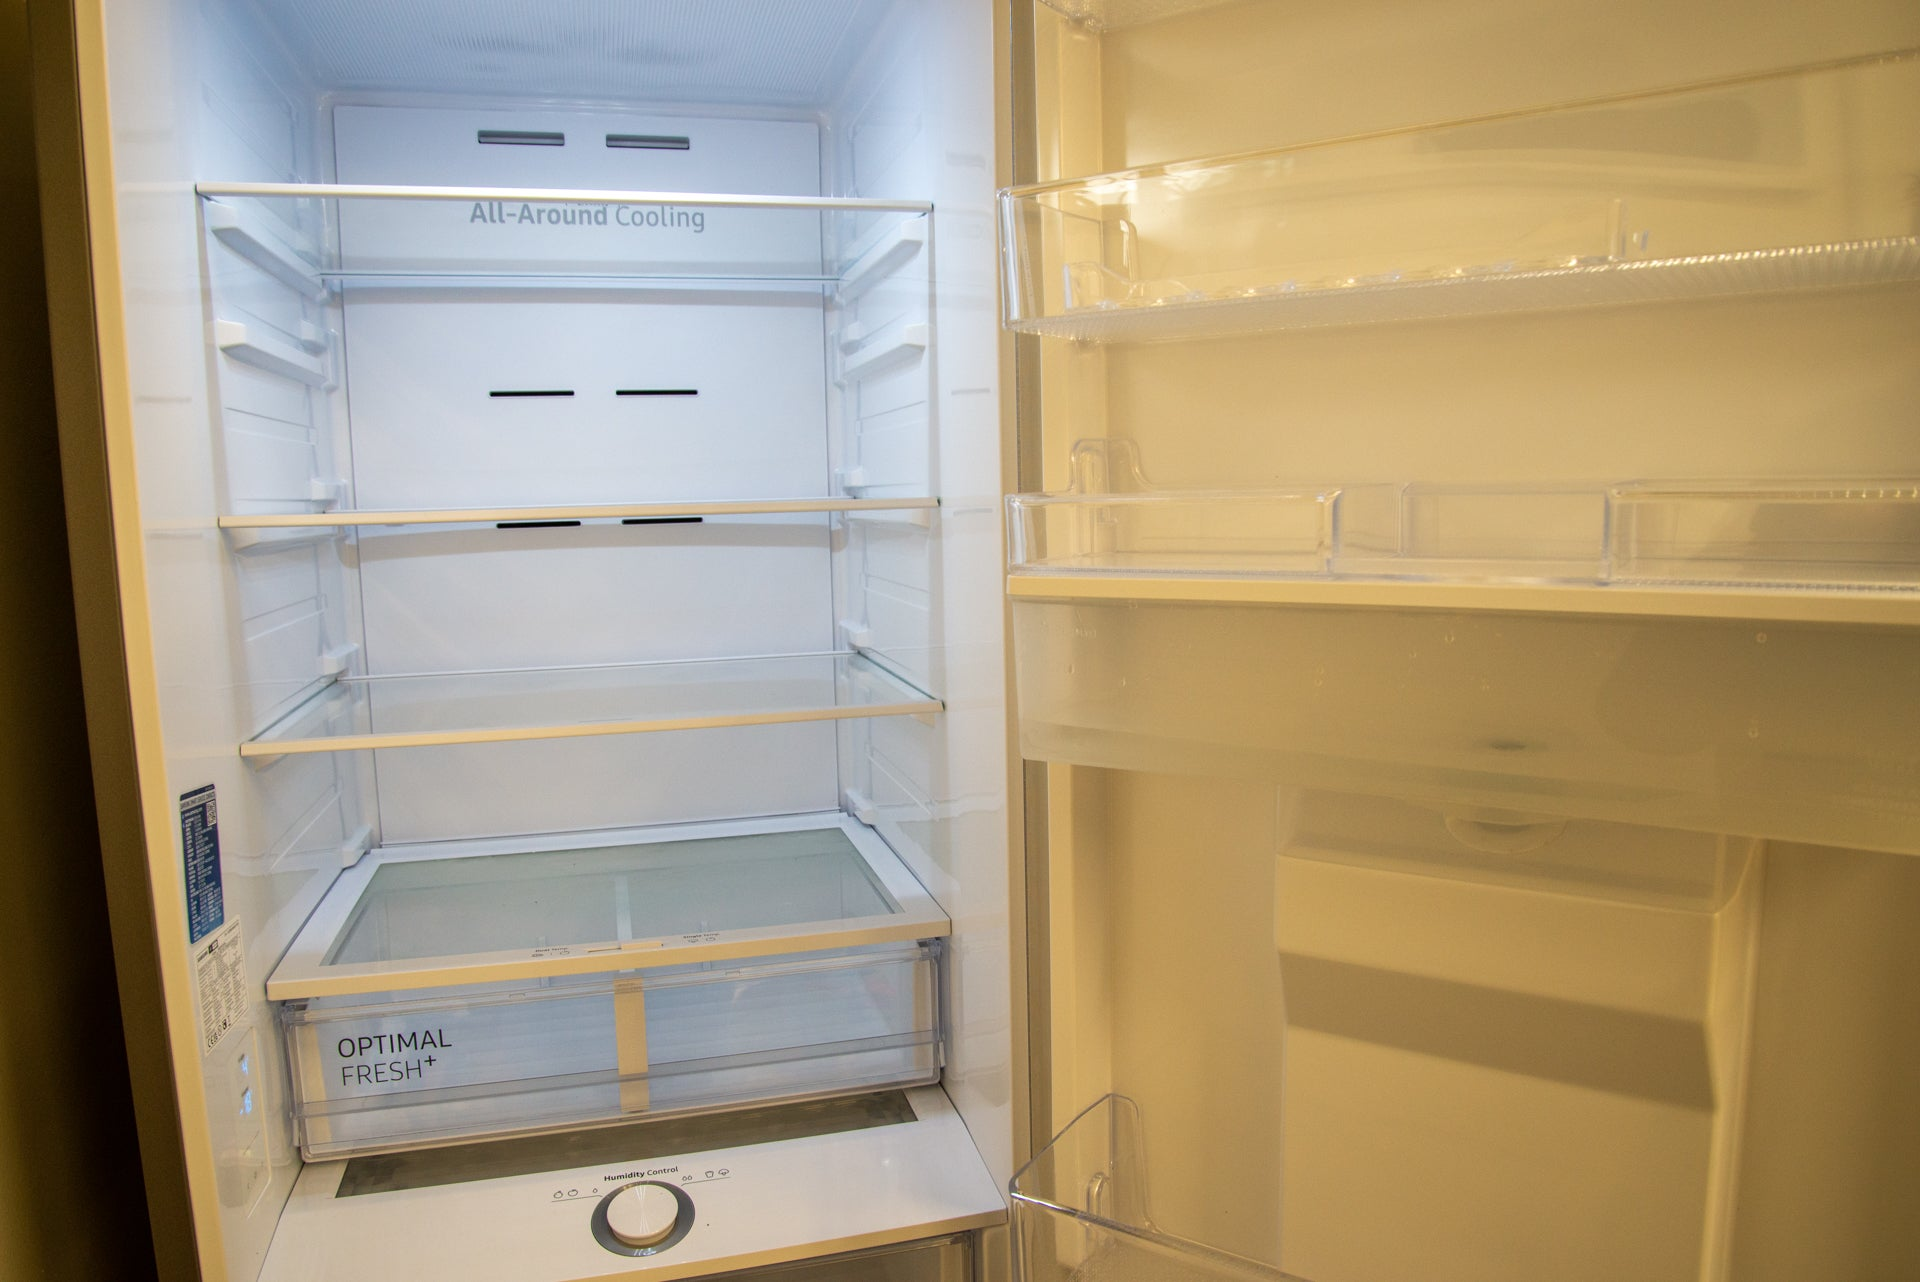 Samsung RB38T633ESA fridge